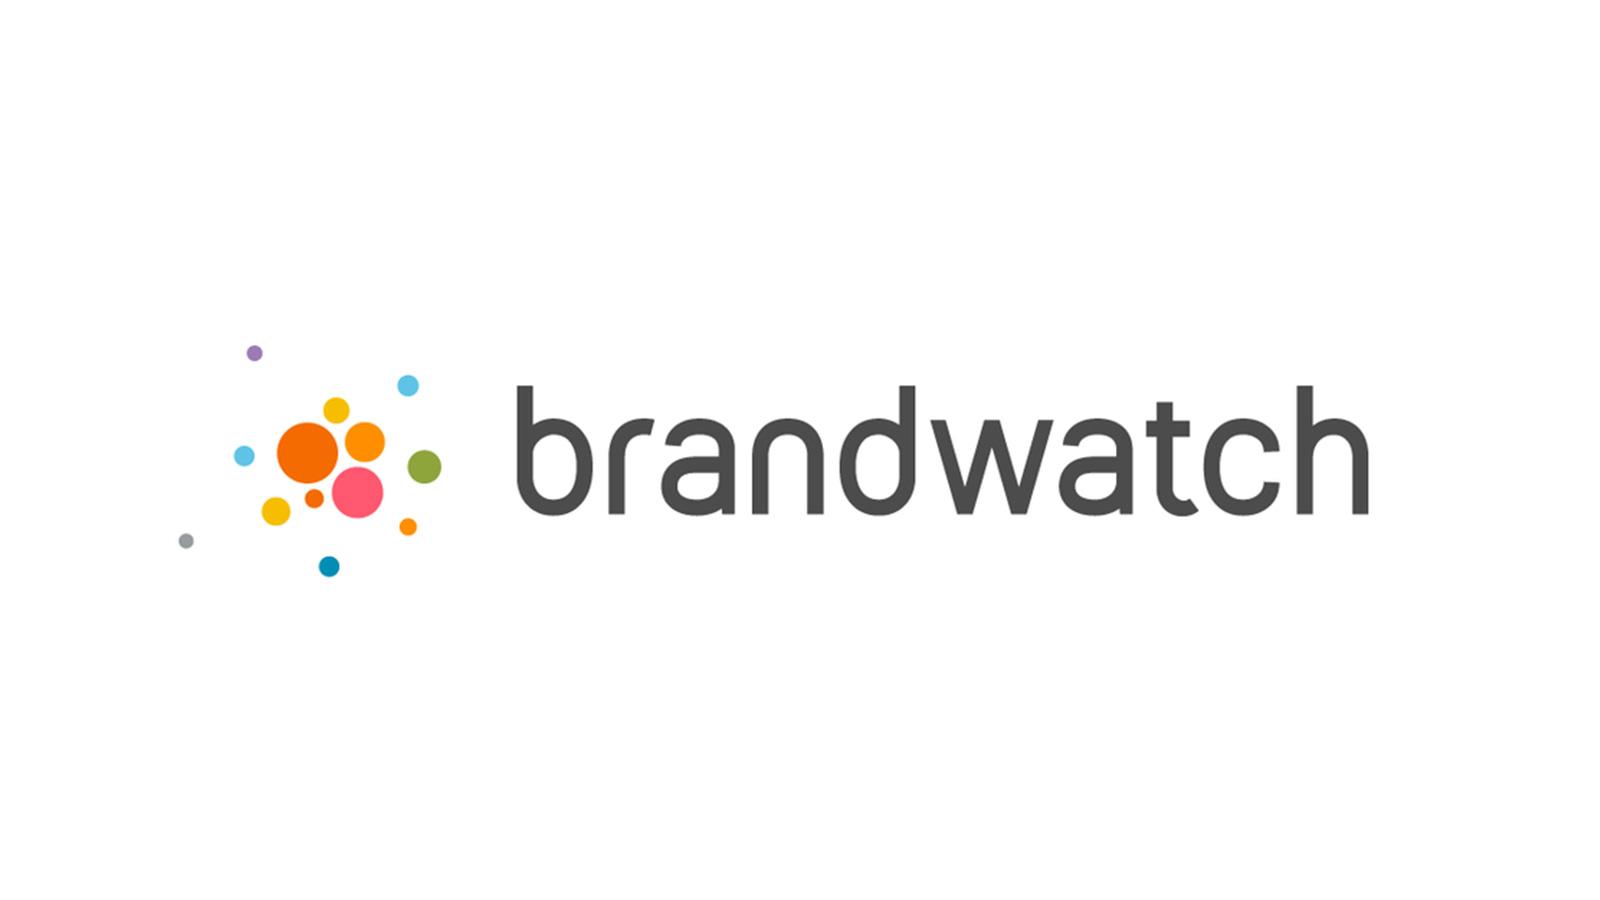 brandwatch.jpg